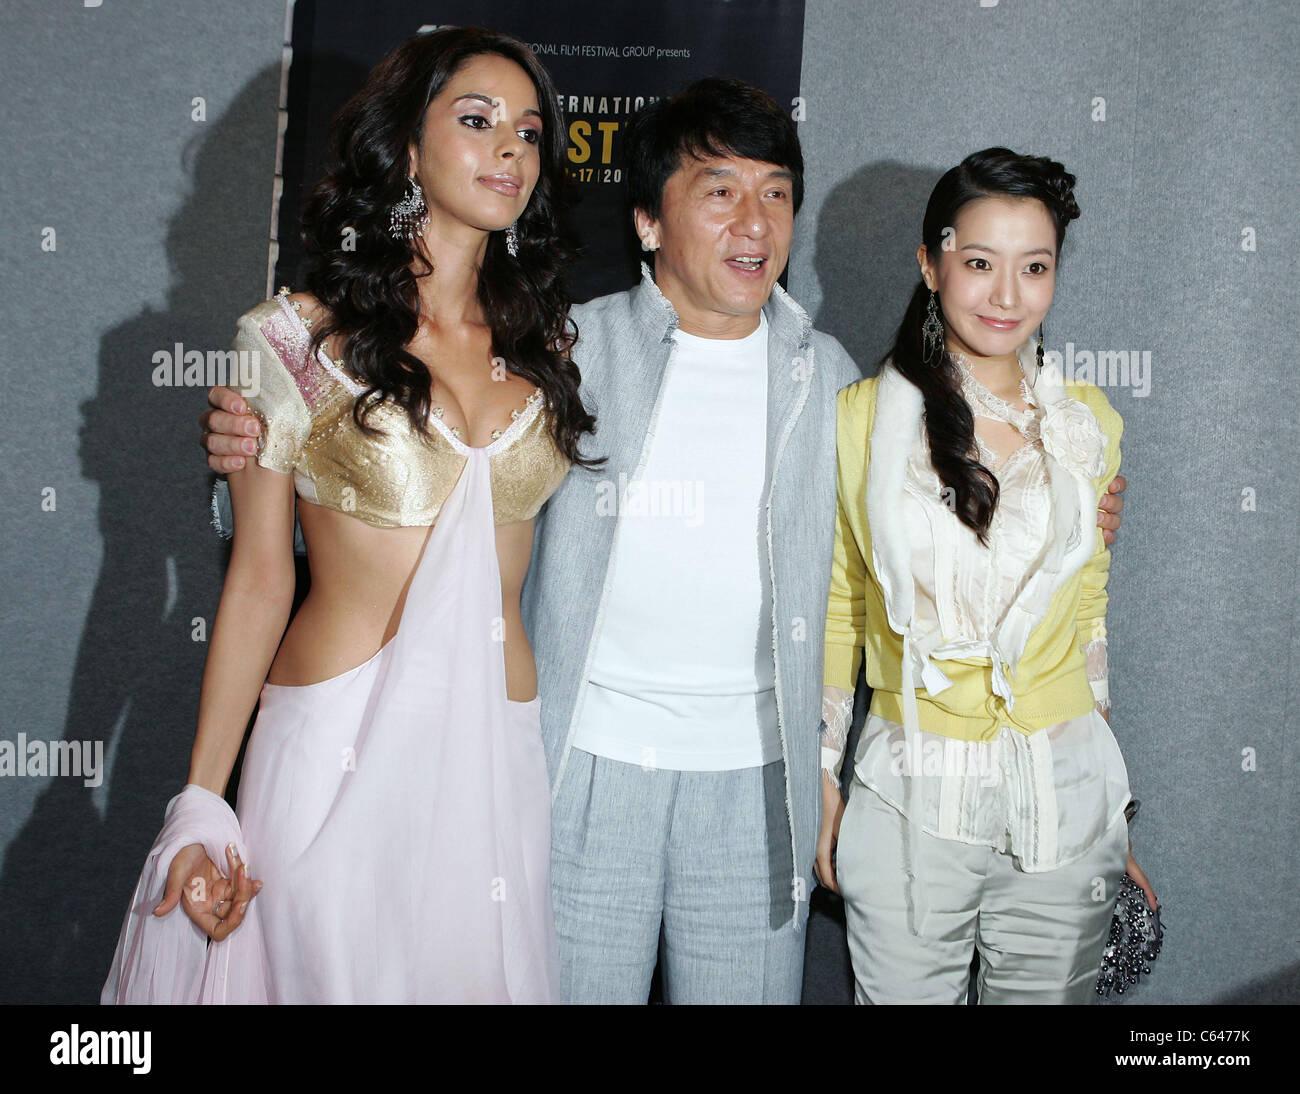 Hee-seon Kim Nude Photos 83